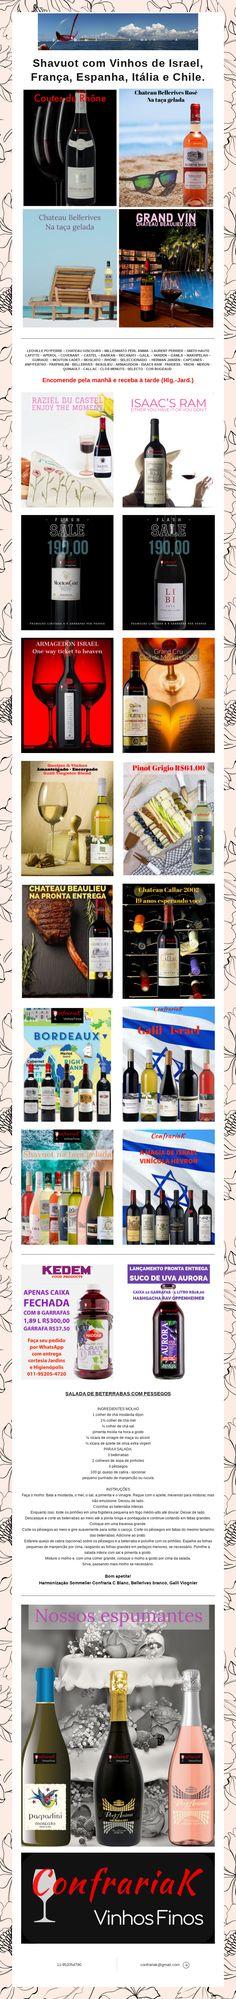 Mouton Cadet, Chile, Laurent Perrier, Wine Pairings, Spain, Italia, Chili